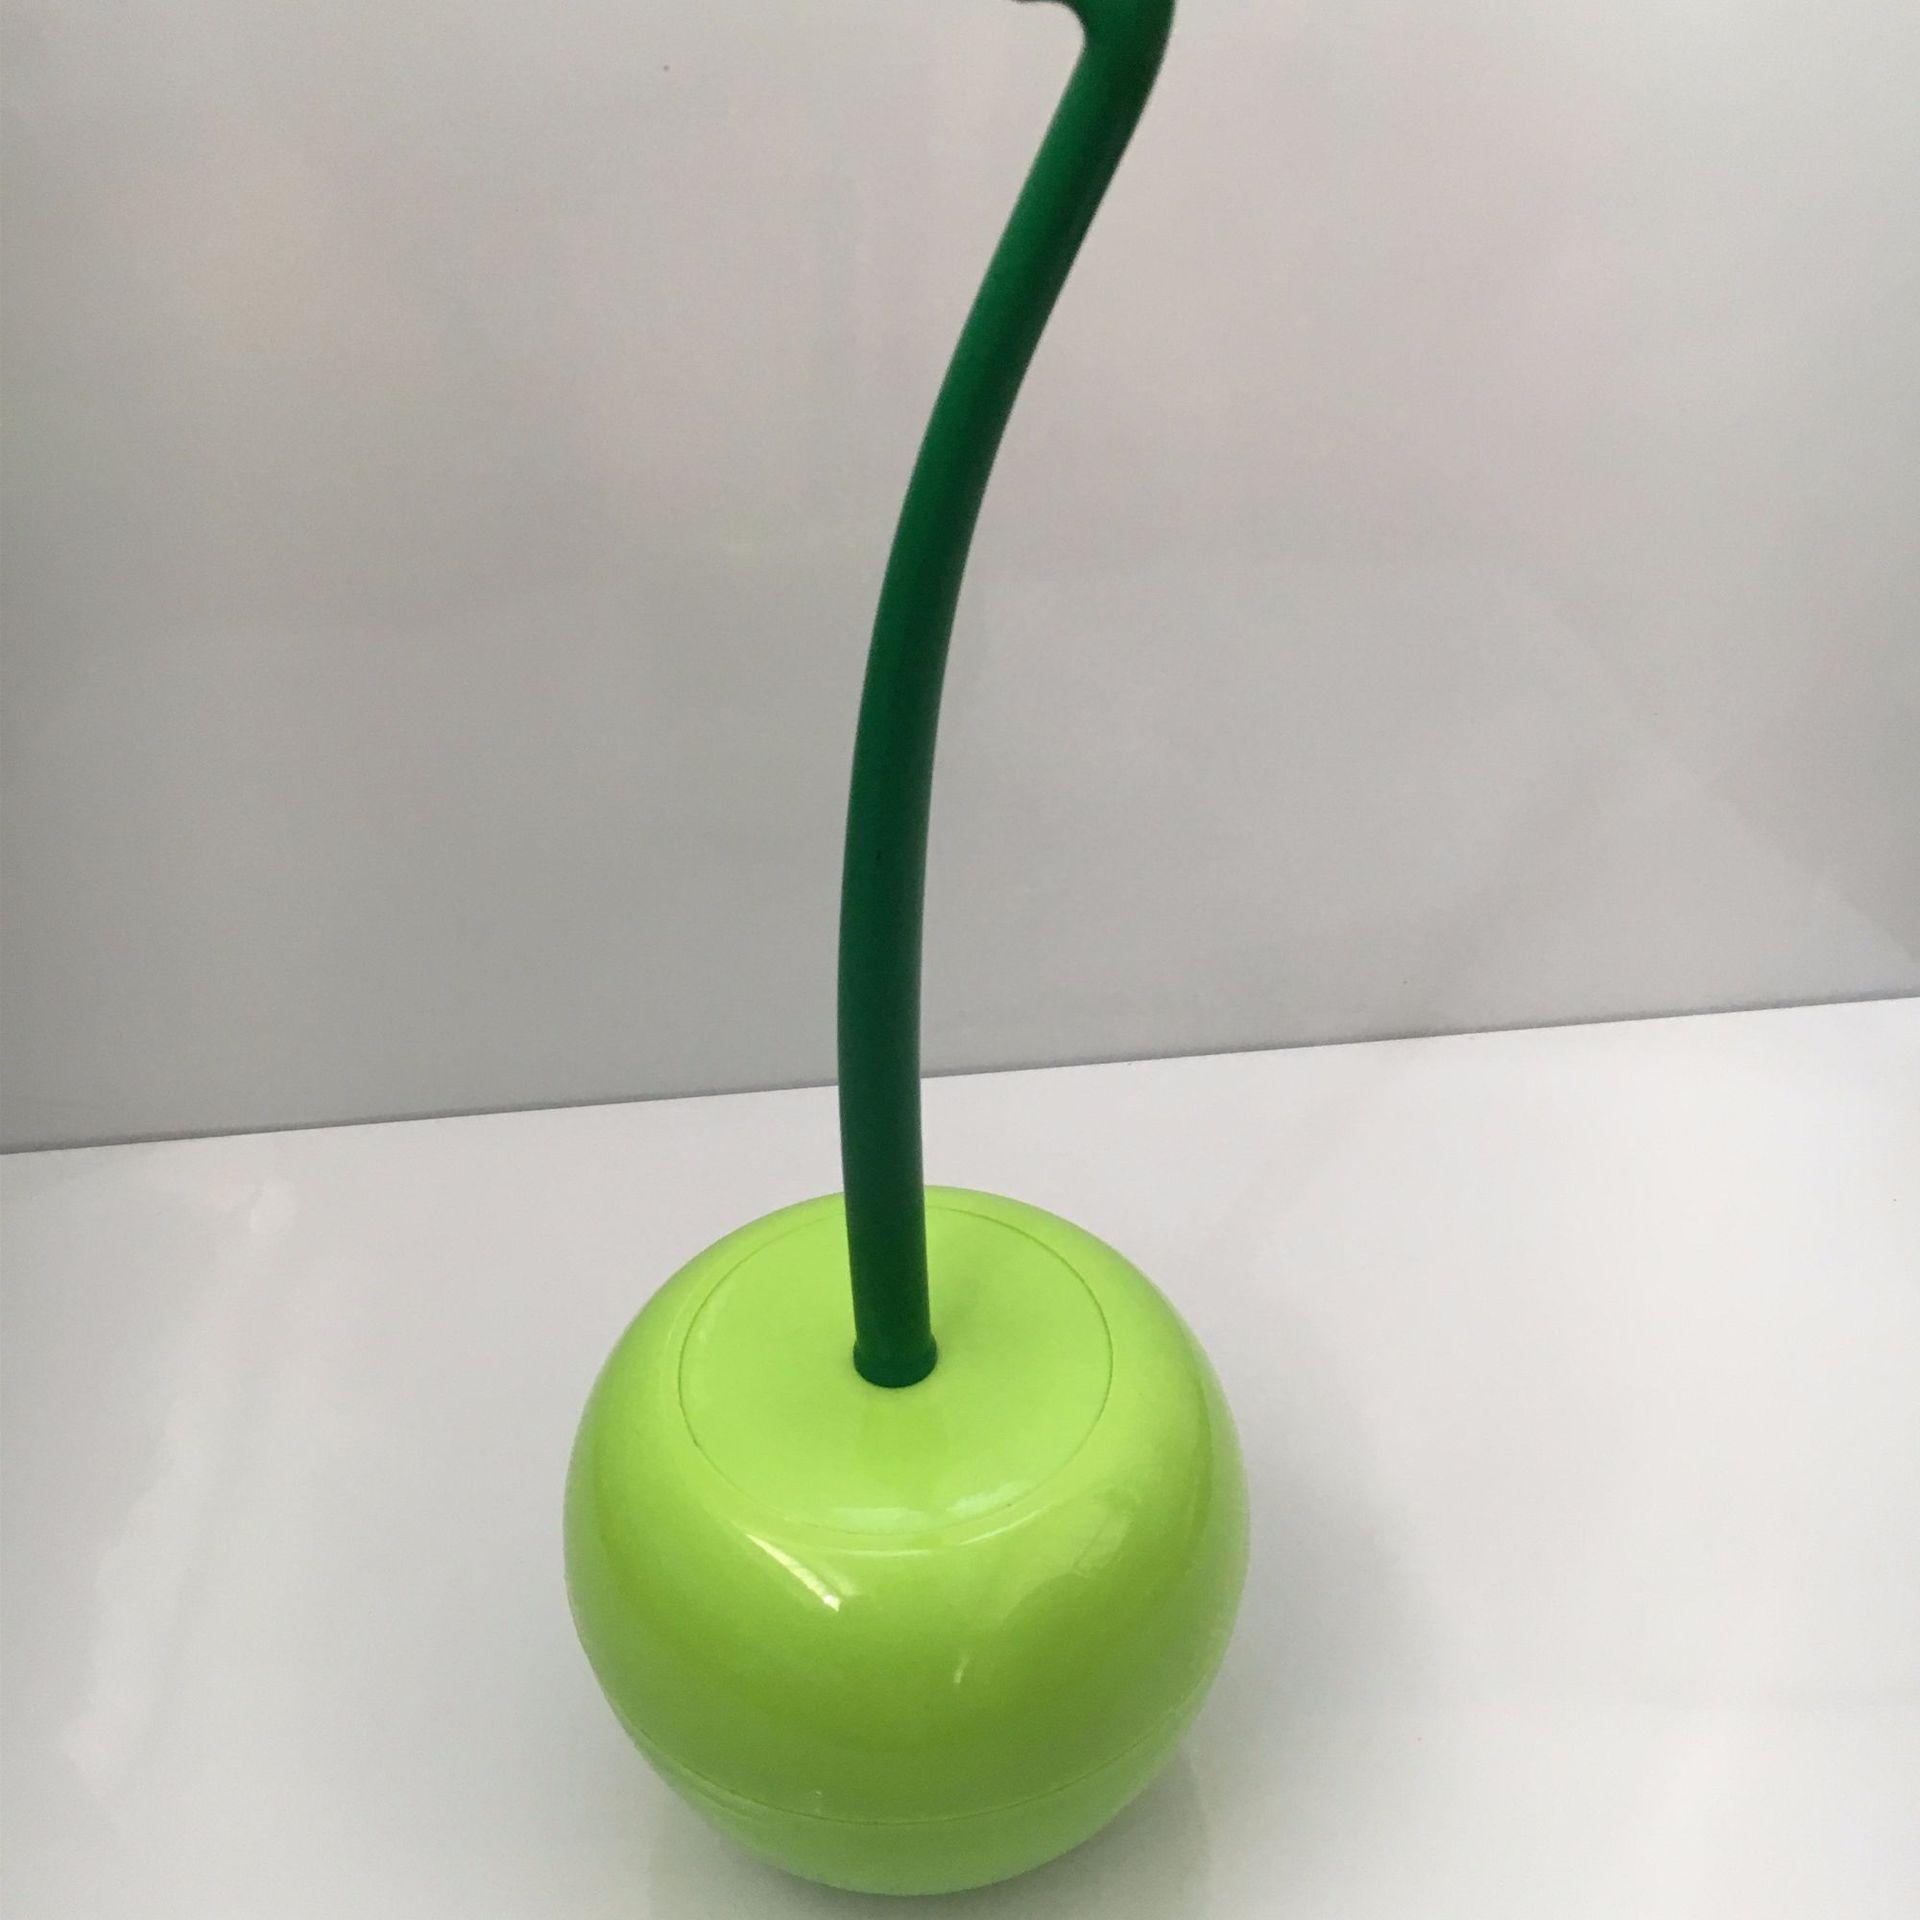 Creative toilet brush cherry toilet brush plastic toilet brush set Green white brush head_39*14*14